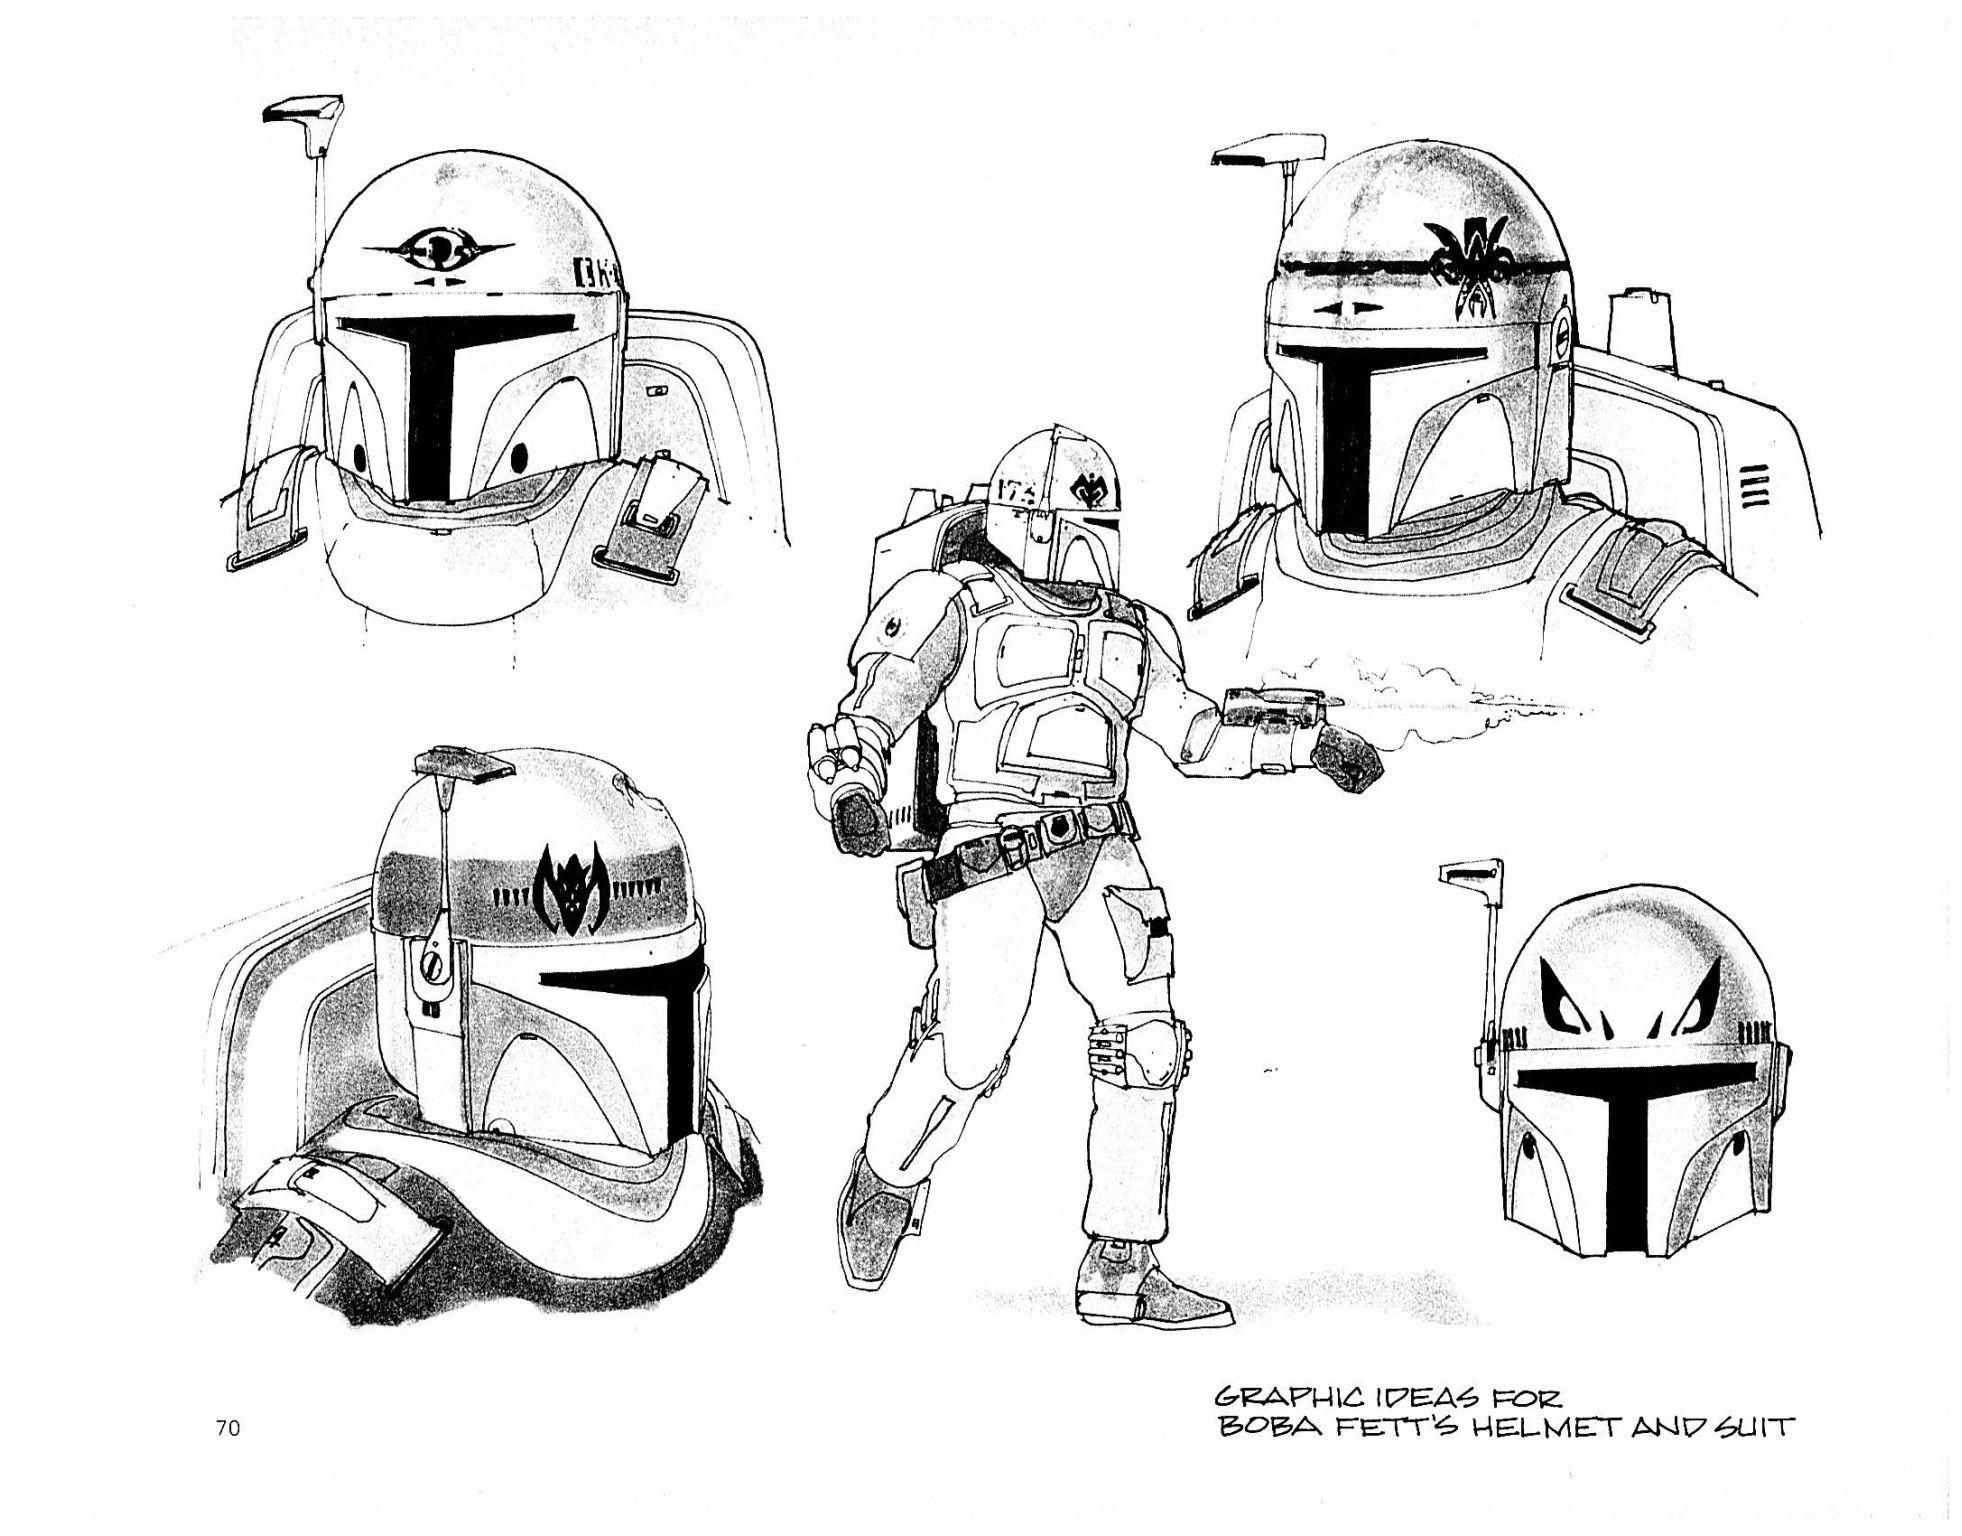 Pin Szerz Je Etale S Collection Kozzeteve Itt Star Wars